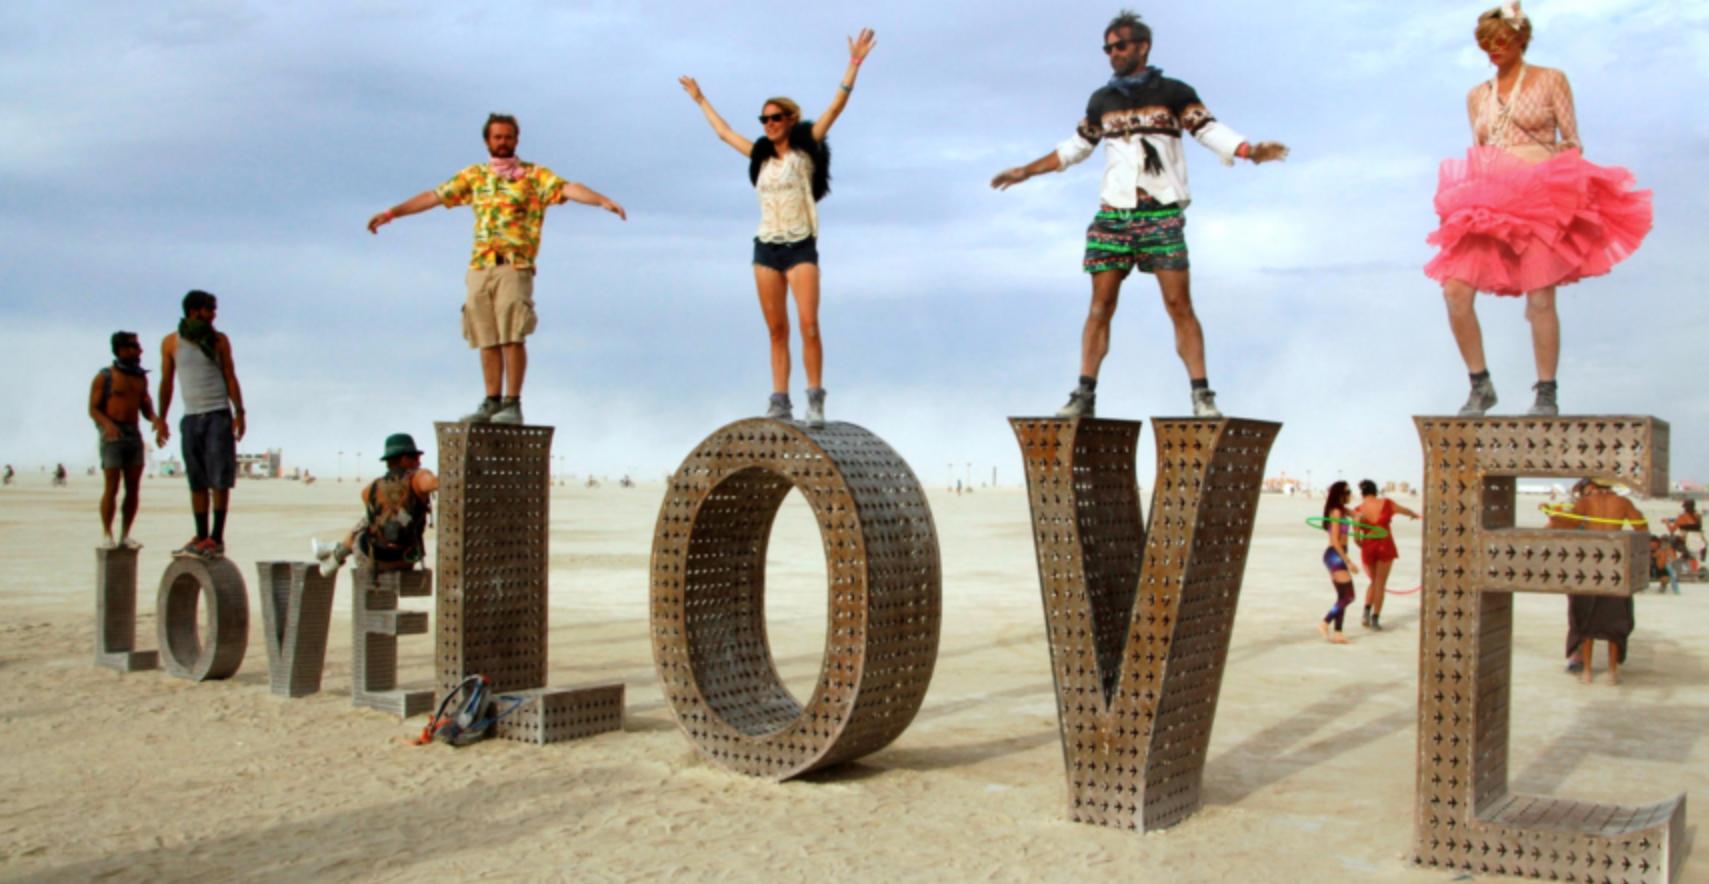 Individuelles Festival in Spanien ähnelt Woodstock